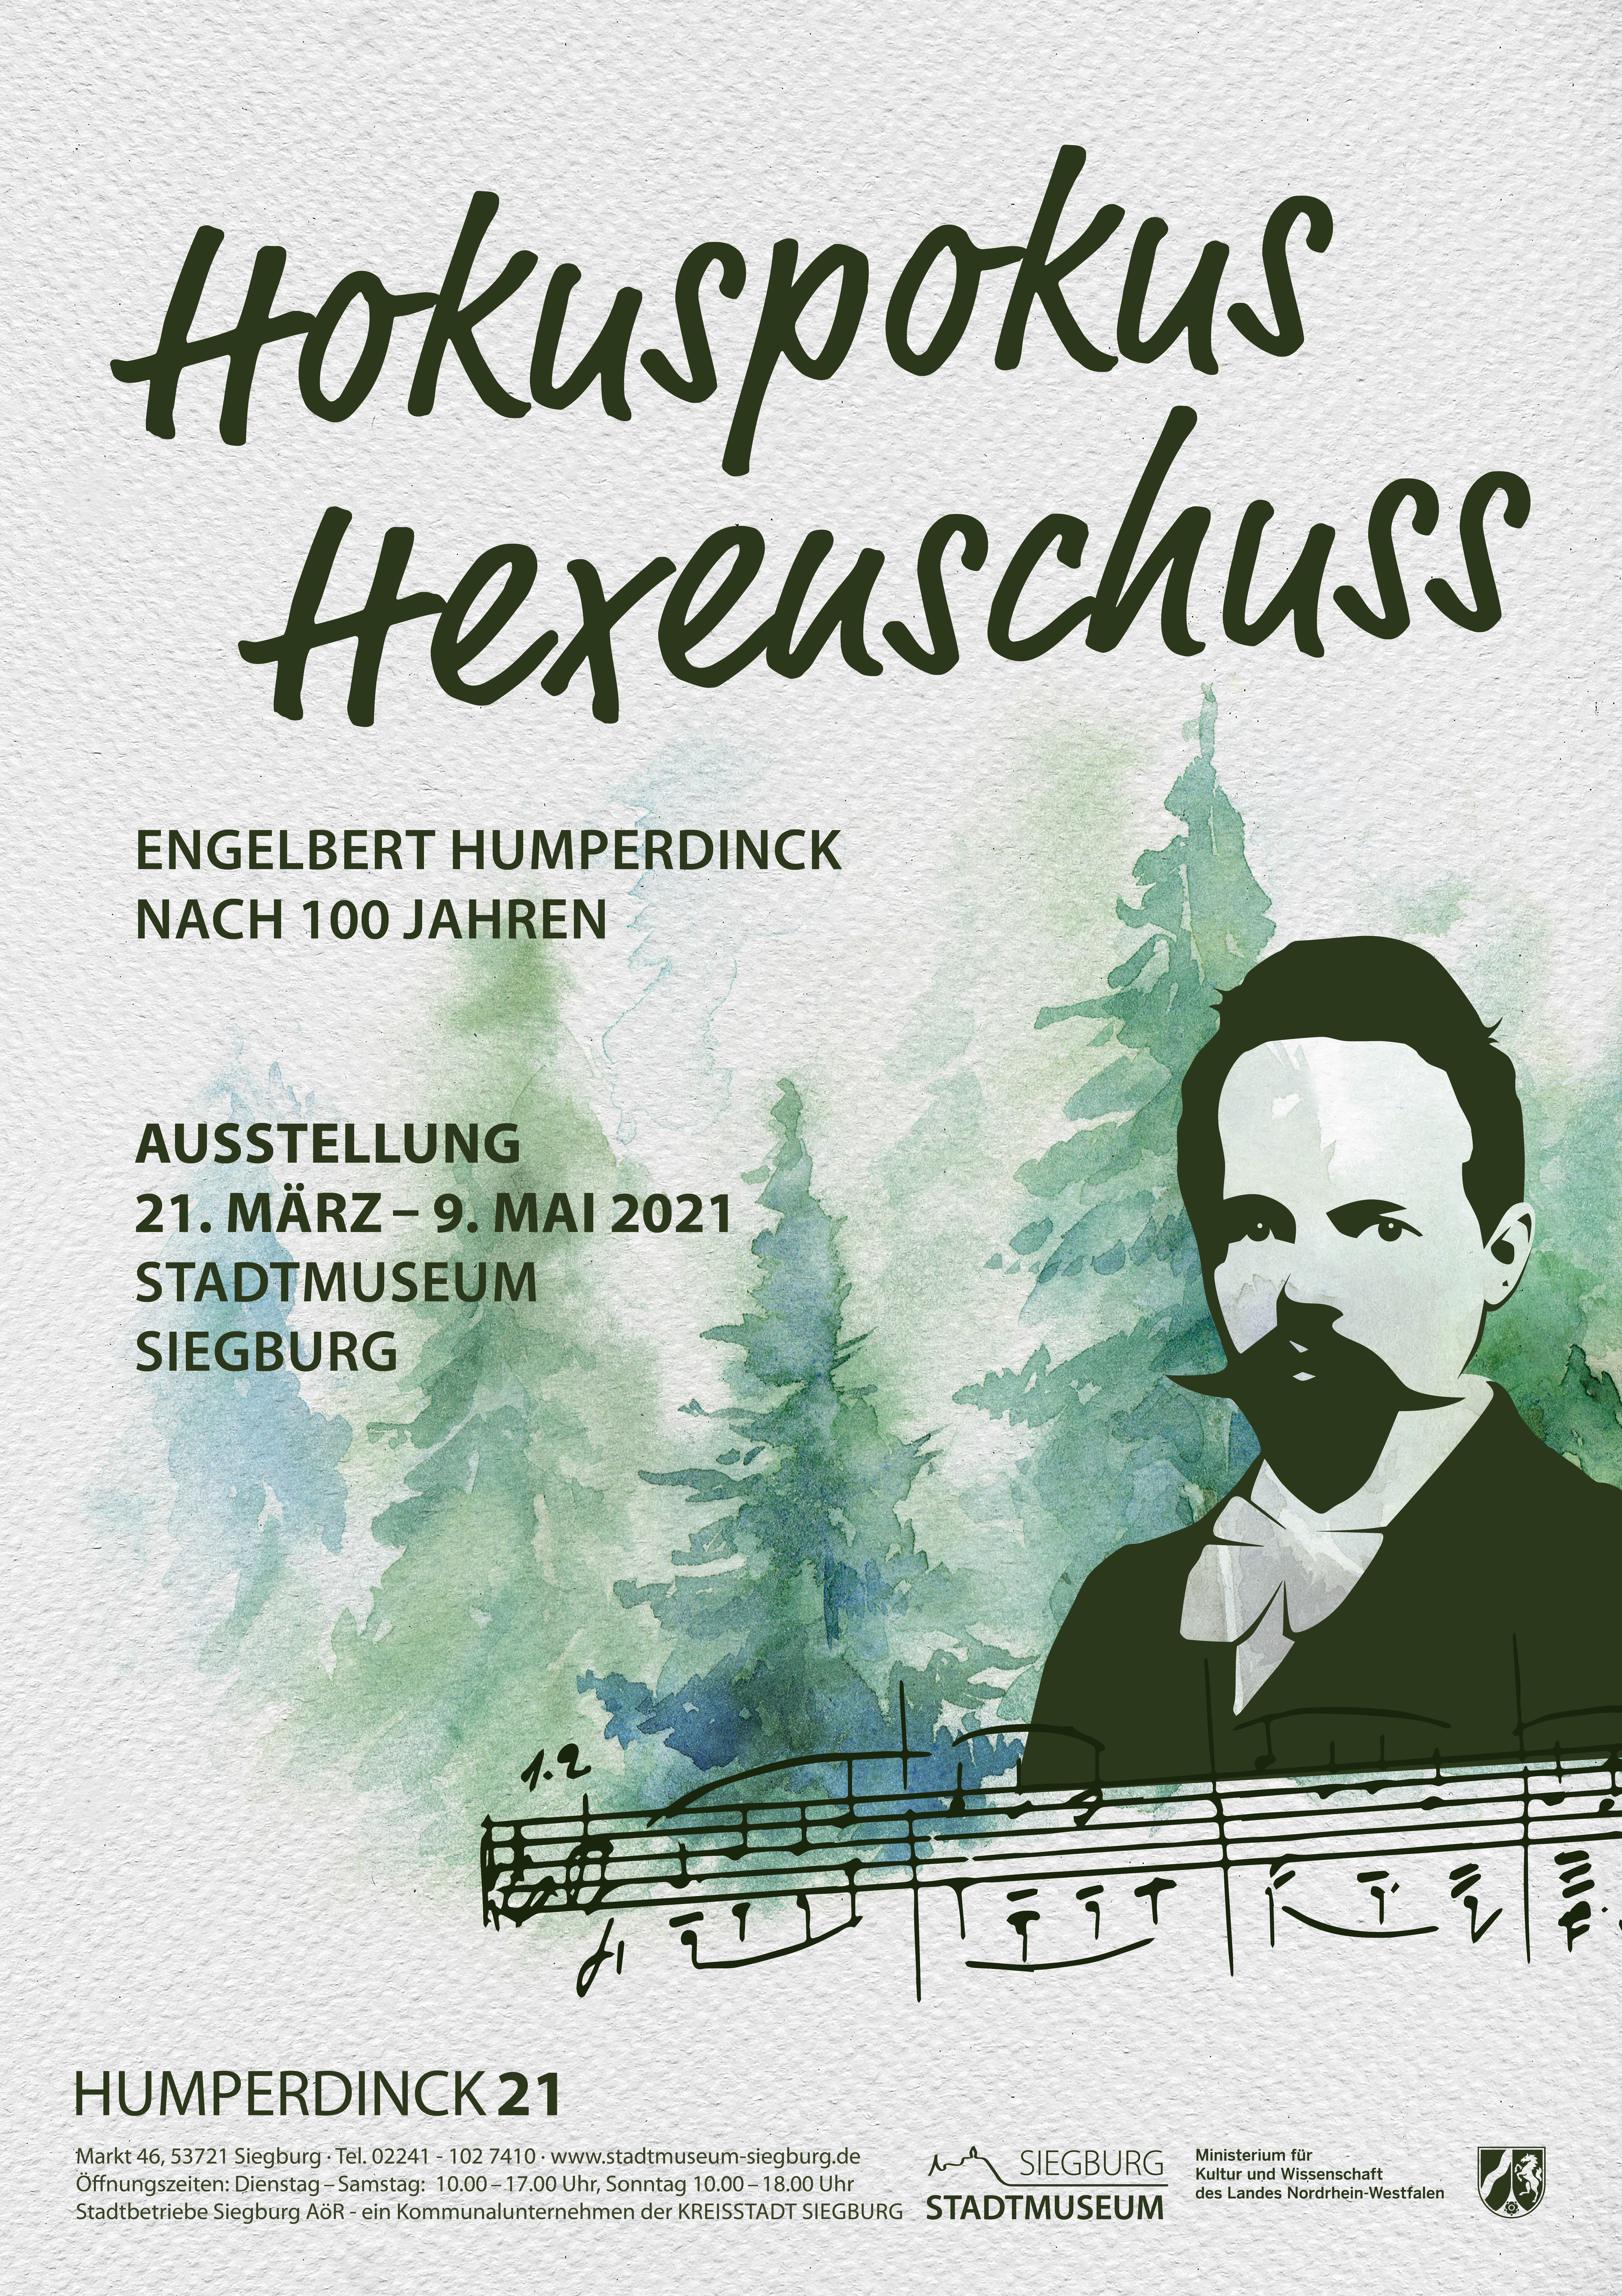 "Plakat zur Ausstellung ""Hokuspokus Hexenschuss"" Engelbert Humperdinck nach 100 Jahren"